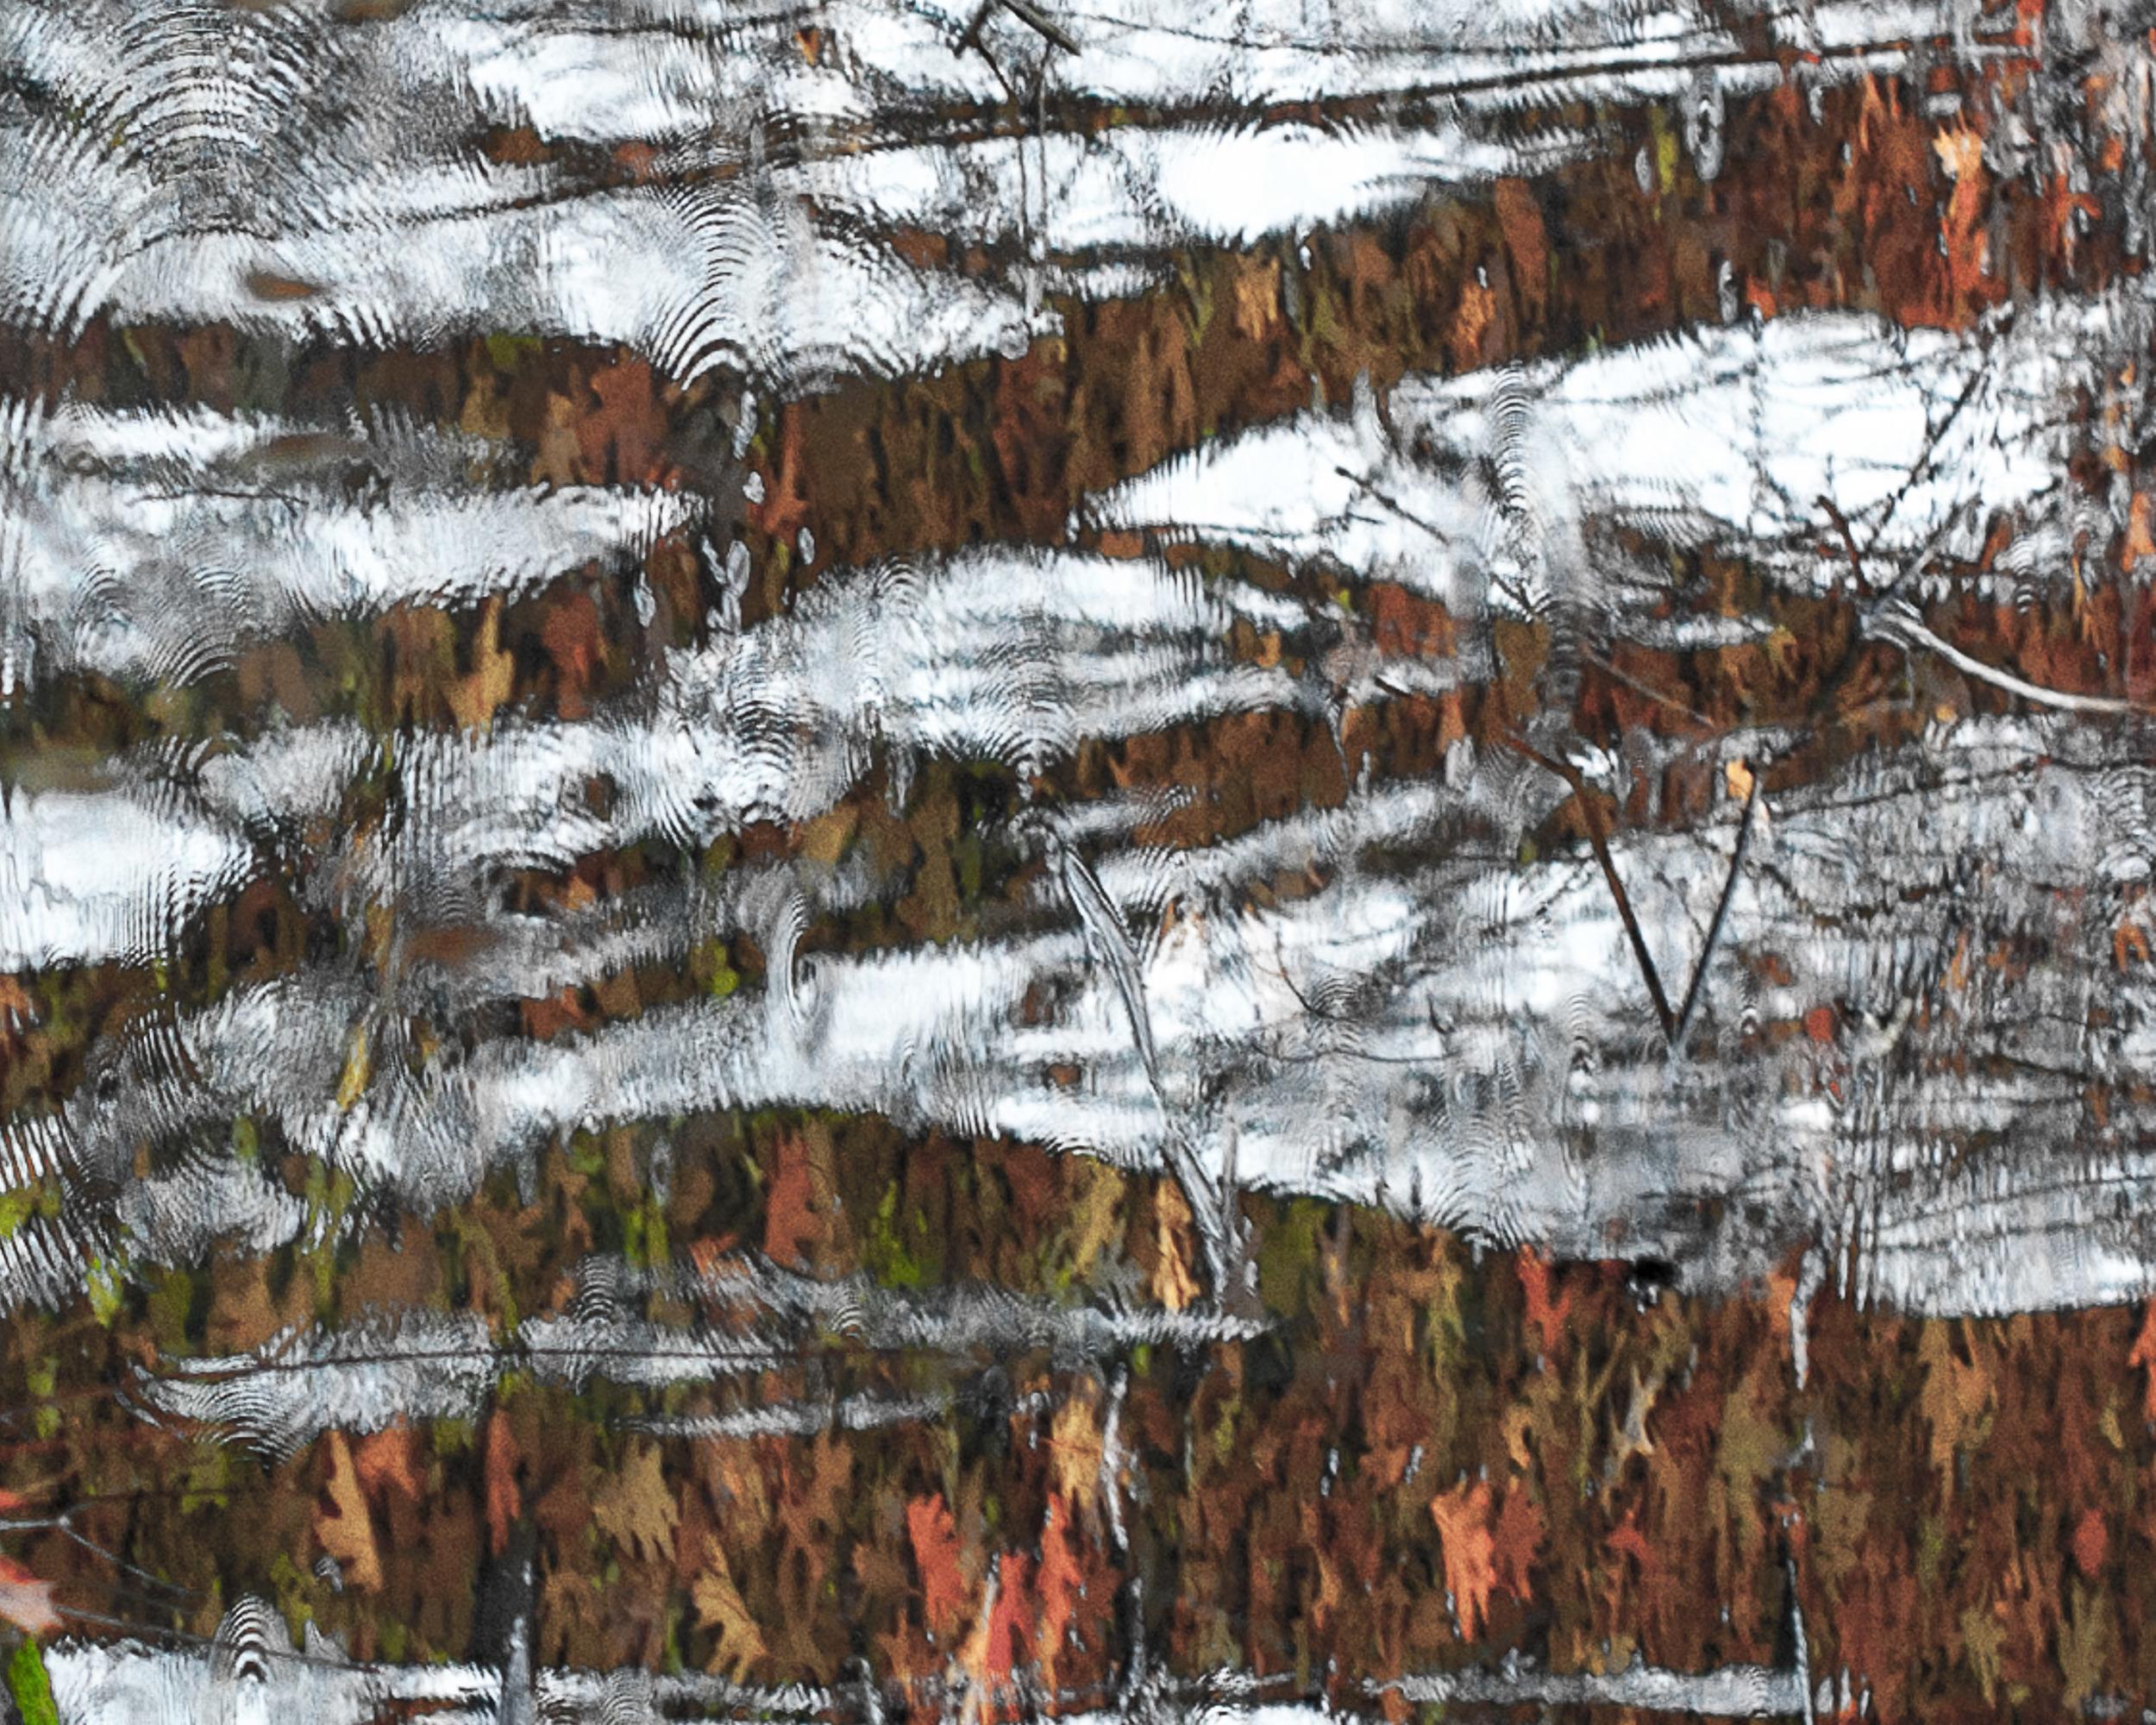 151214 Fall Ice Floe 8x10-0019.jpg